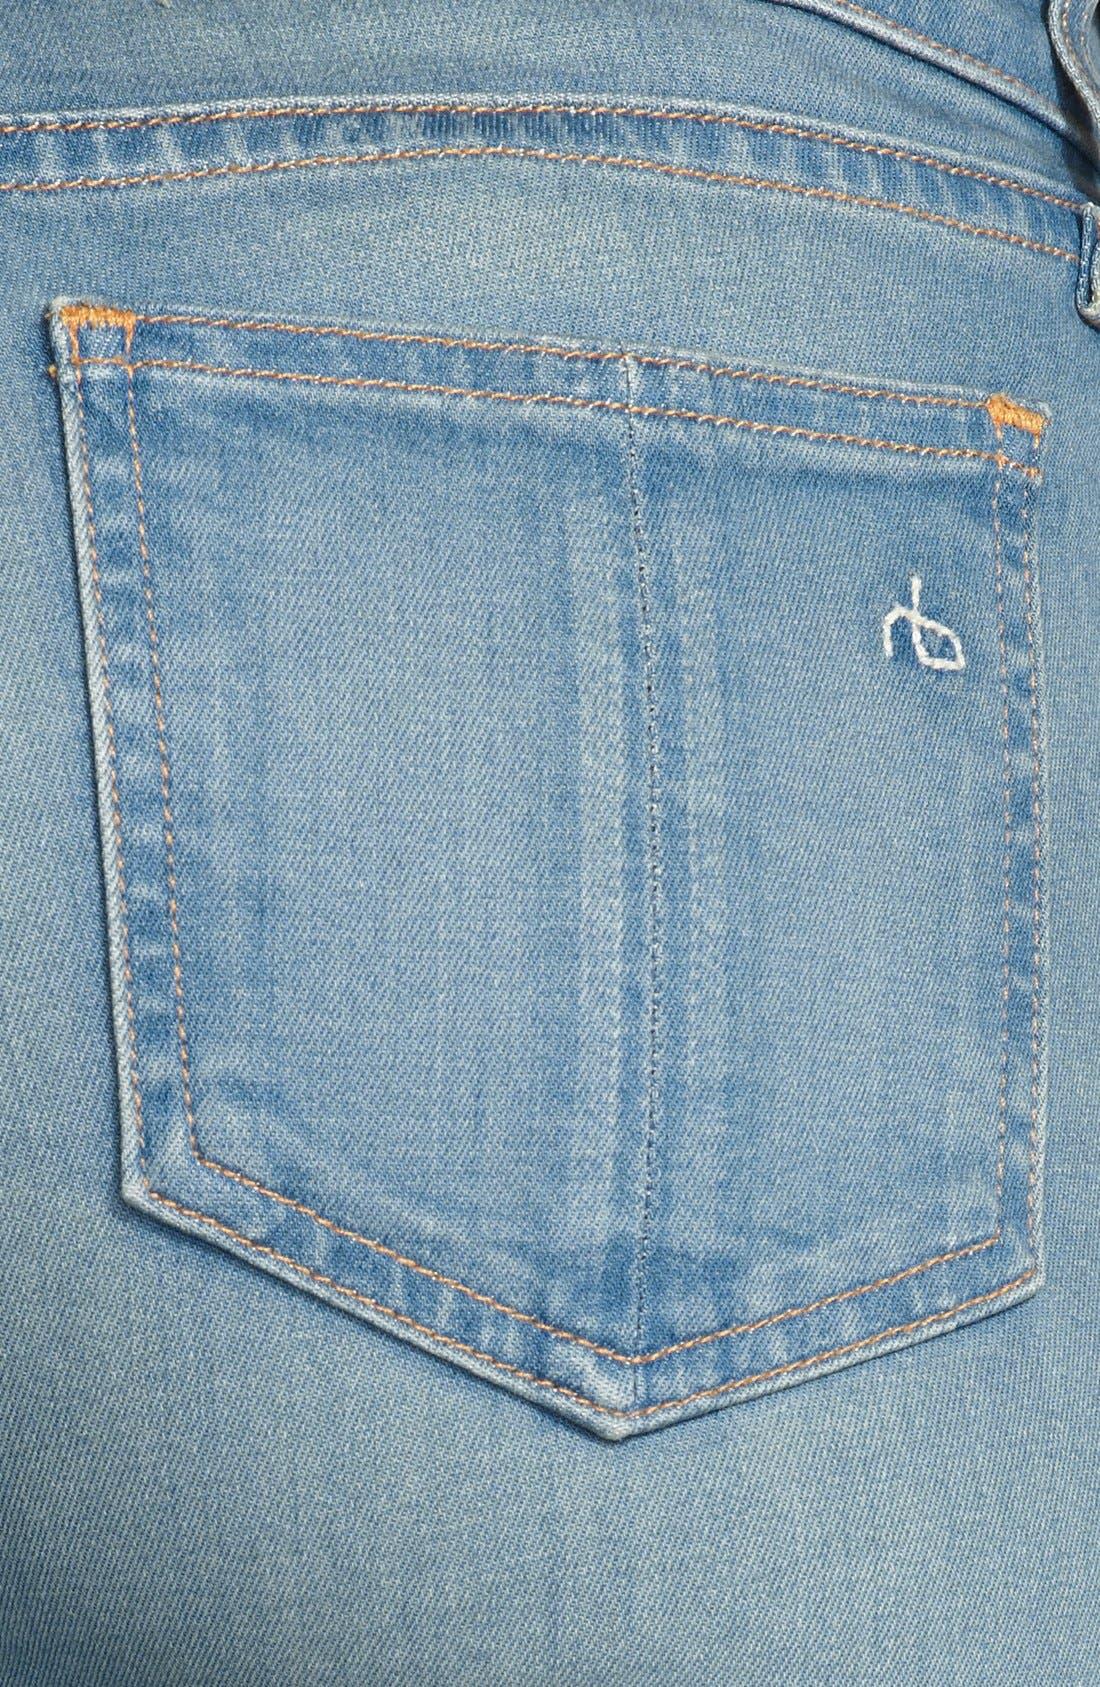 Alternate Image 3  - rag & bone/JEAN High Rise Skinny Jeans (Calvary)